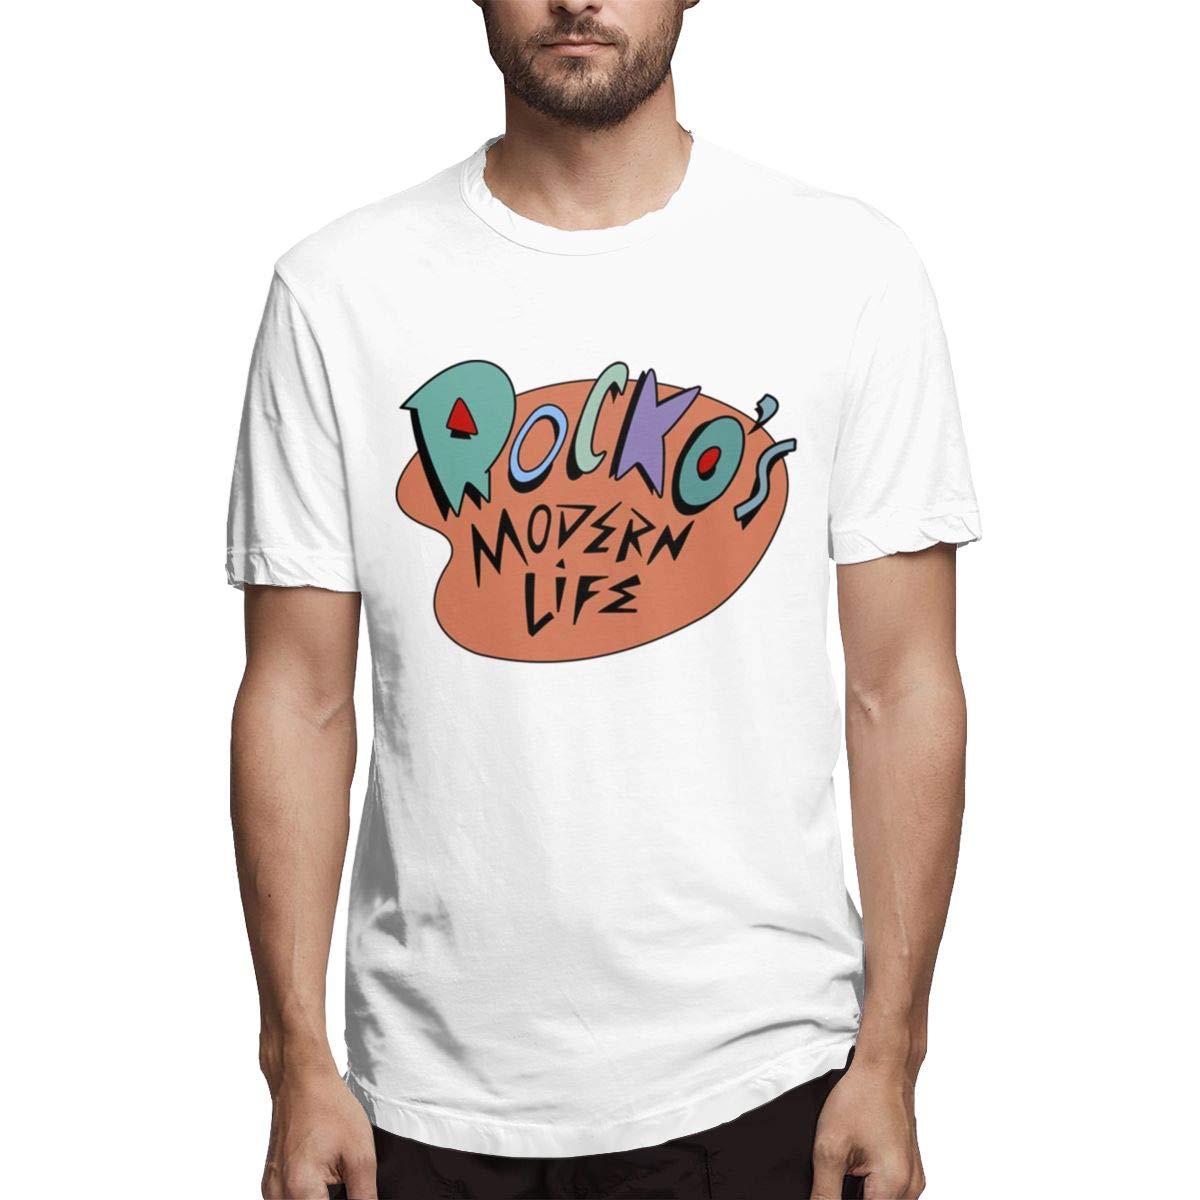 LANBRELLA Mens Rockos Modern Life Sport Crew-Neck Short Sleeve T-Shirt for Men